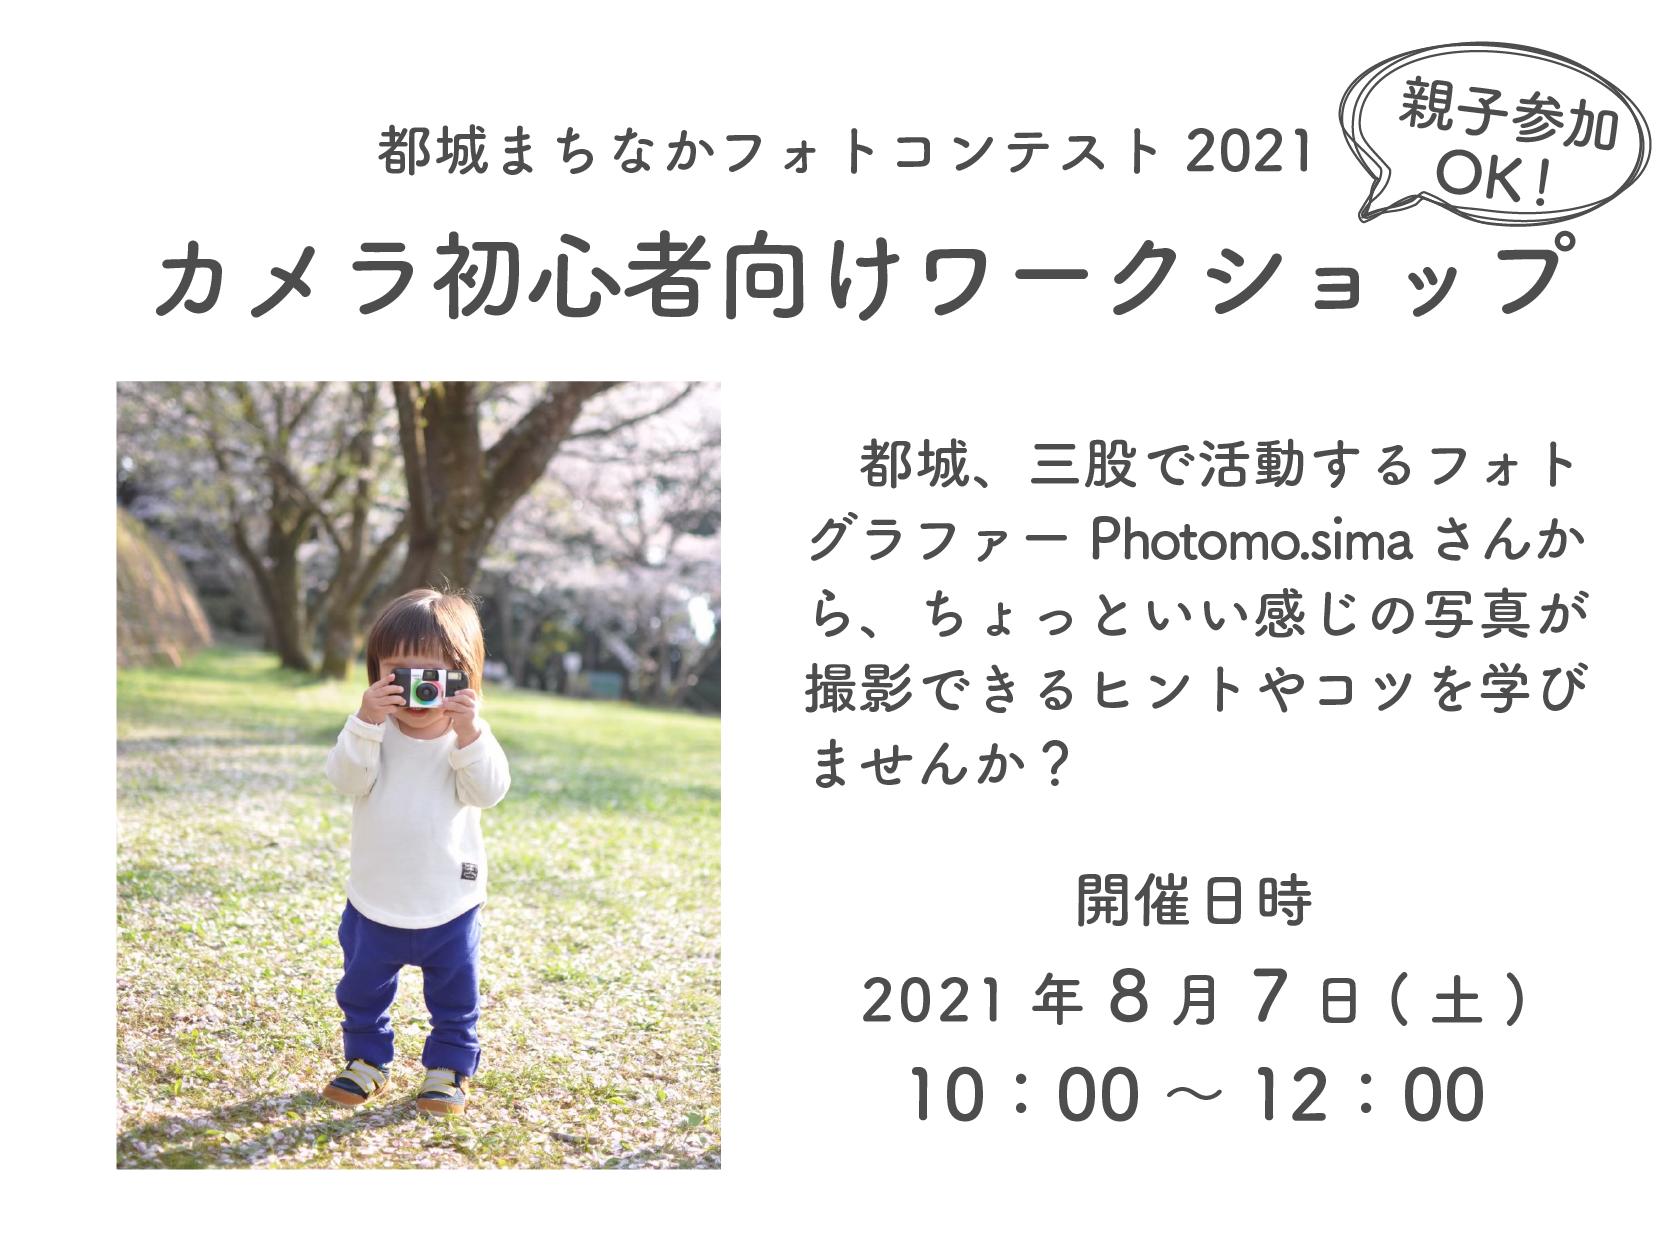 <p>都城まちなかフォトコンテスト2021 初心者向けワークショップ</p>